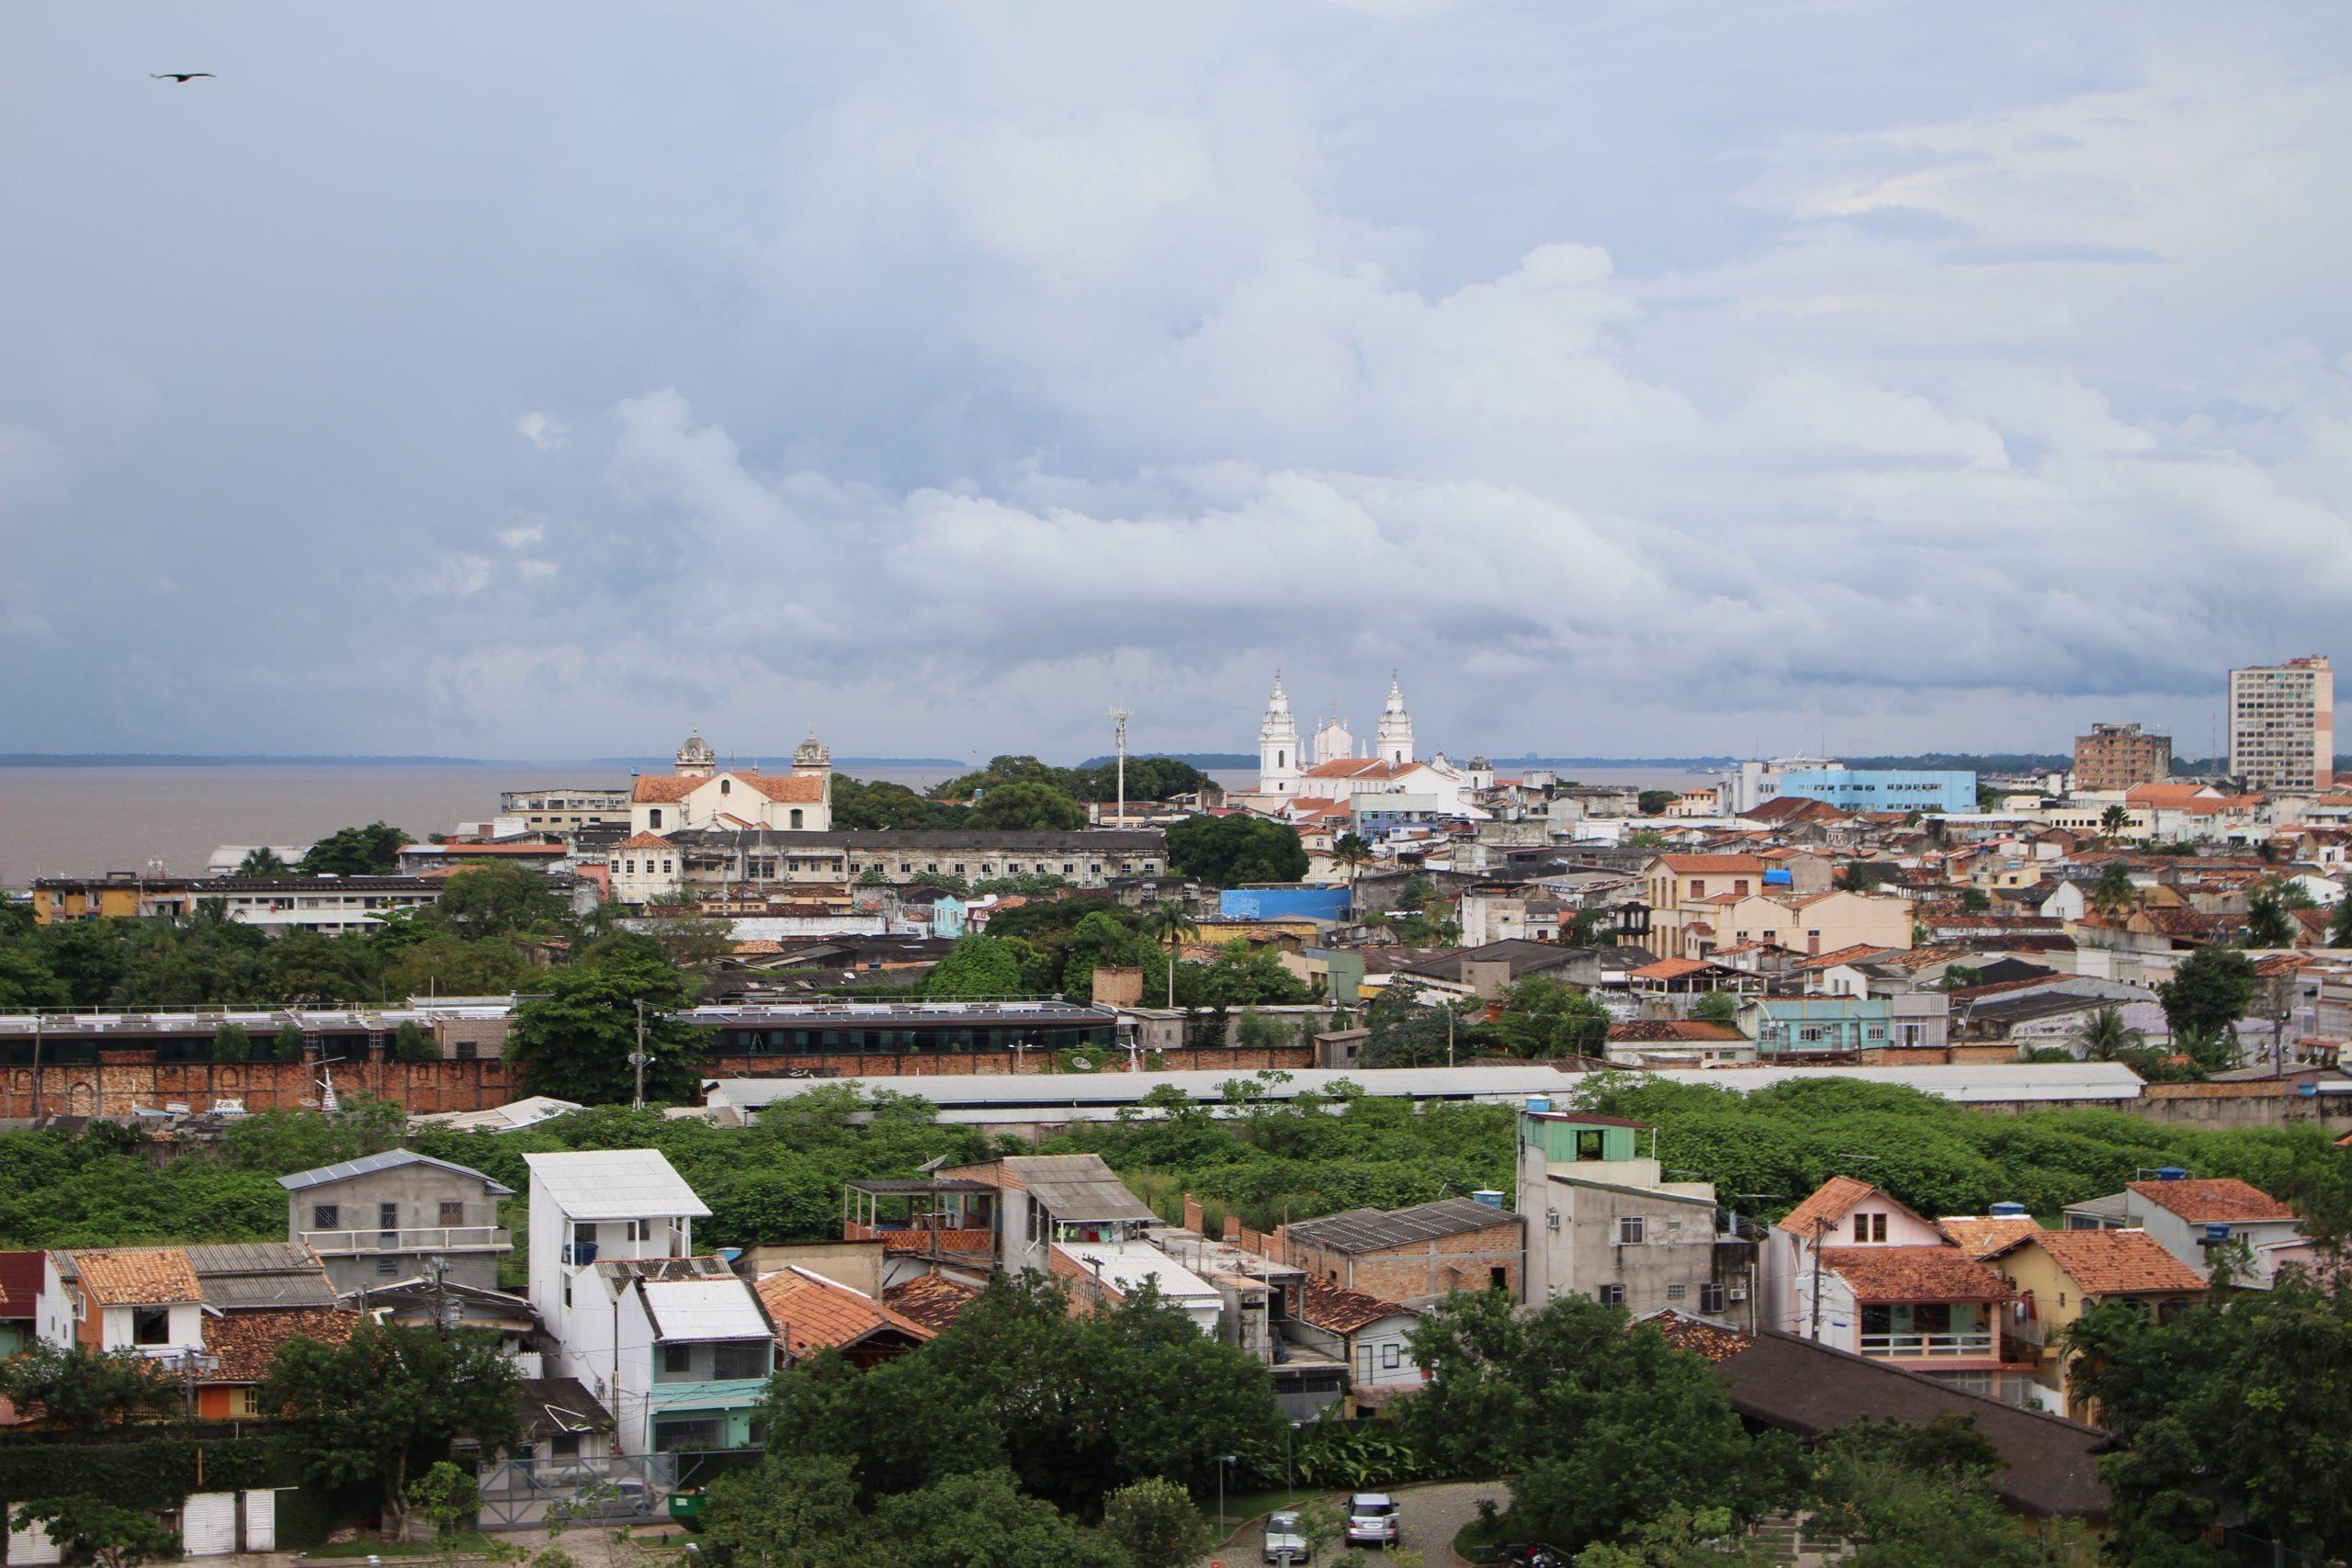 mangal_das_garcas_farol_de_belem_panorama_cidade